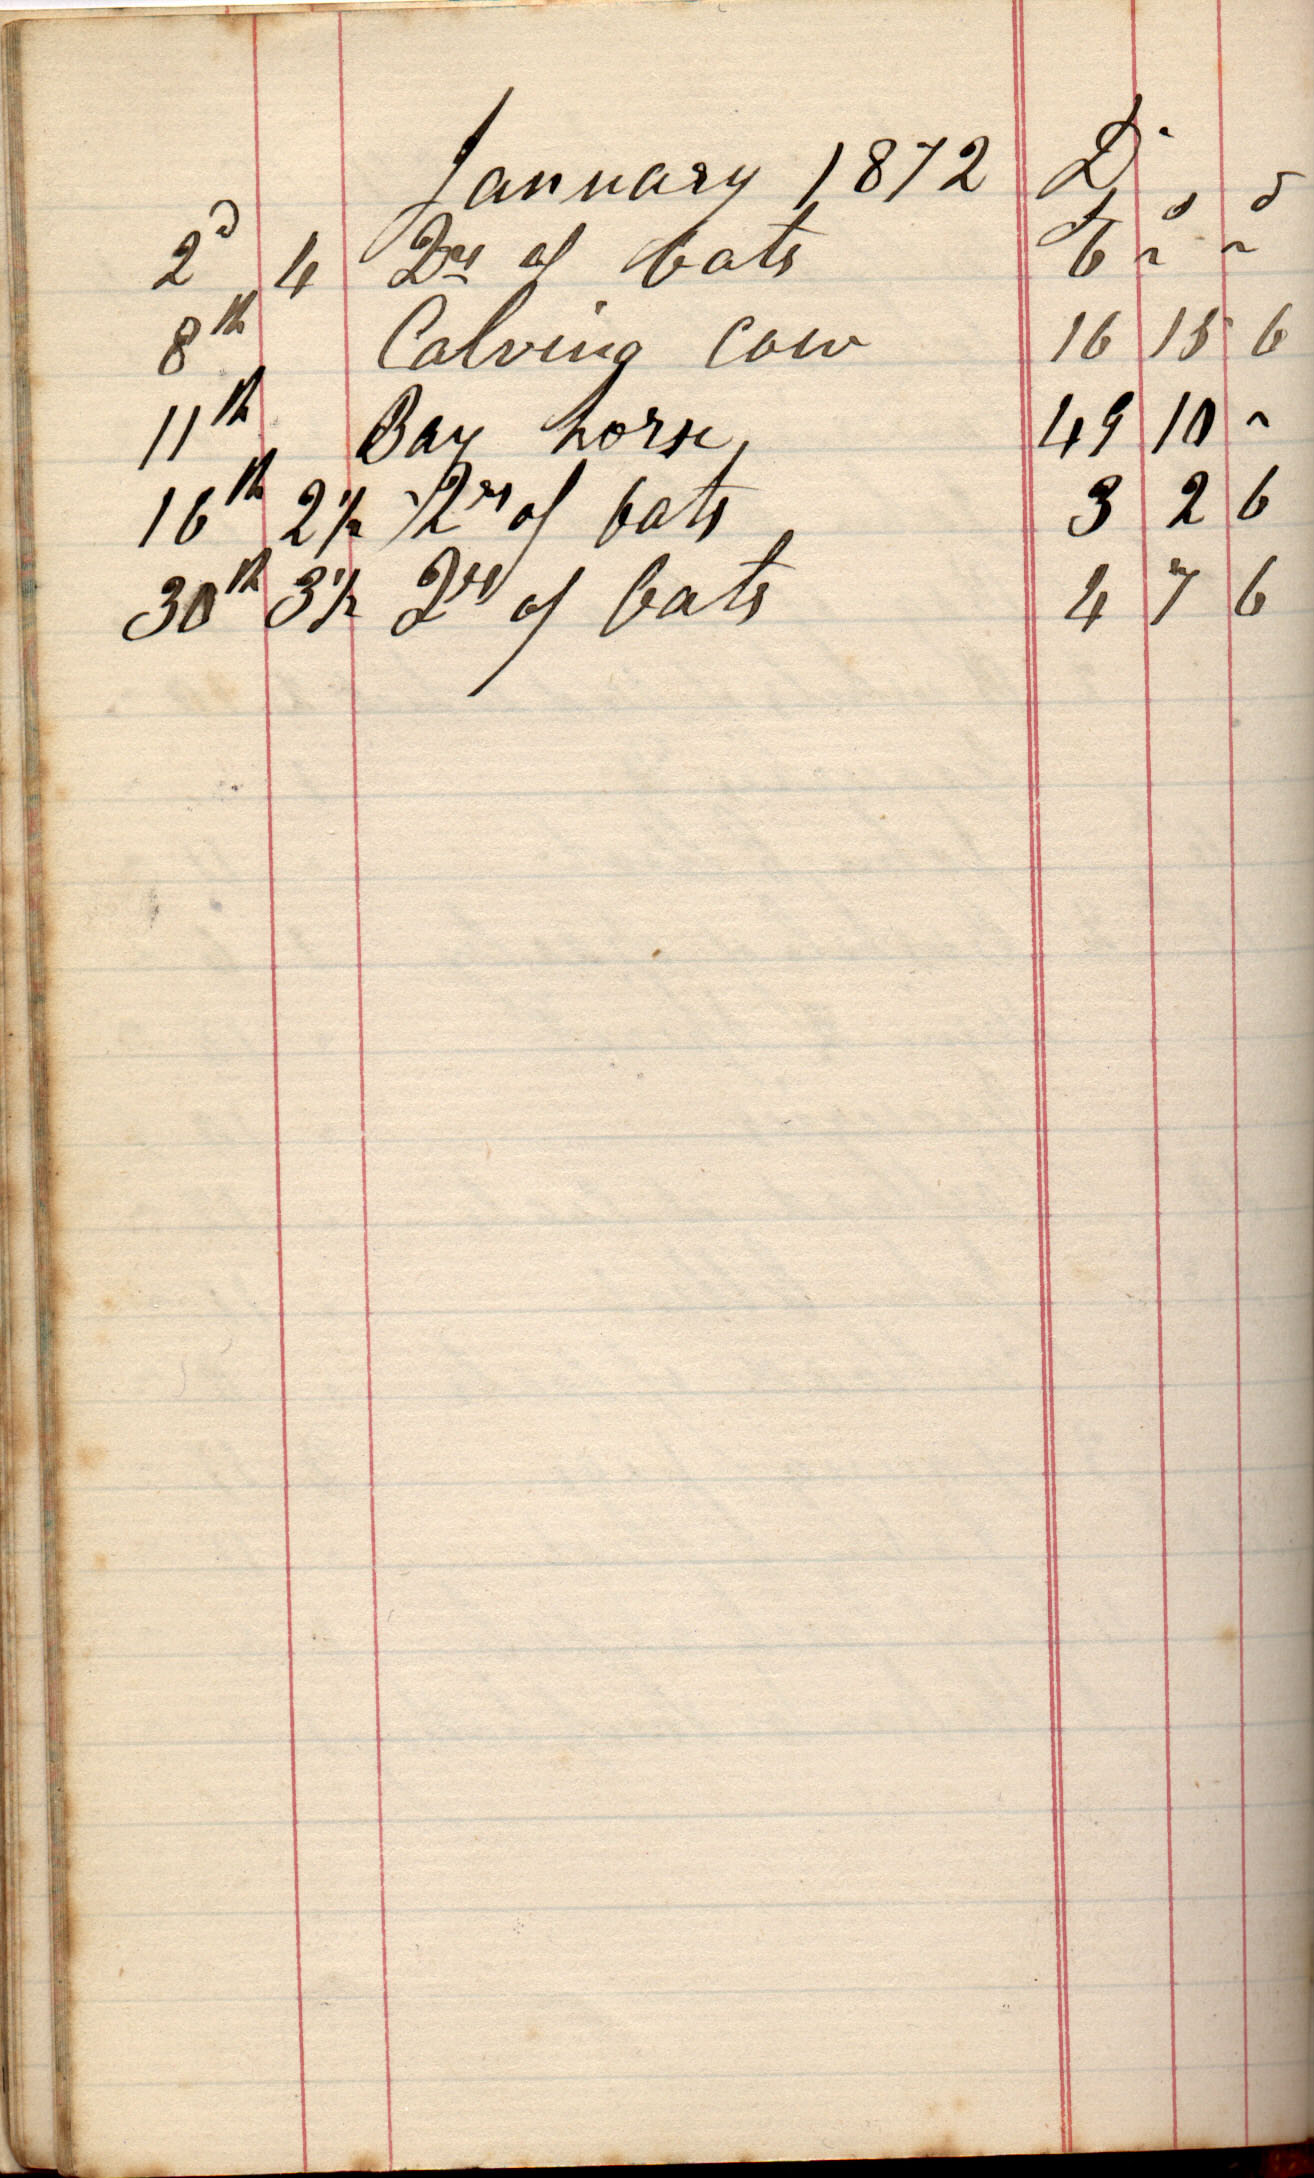 Little Blencow Farm Accounts Income January 1872